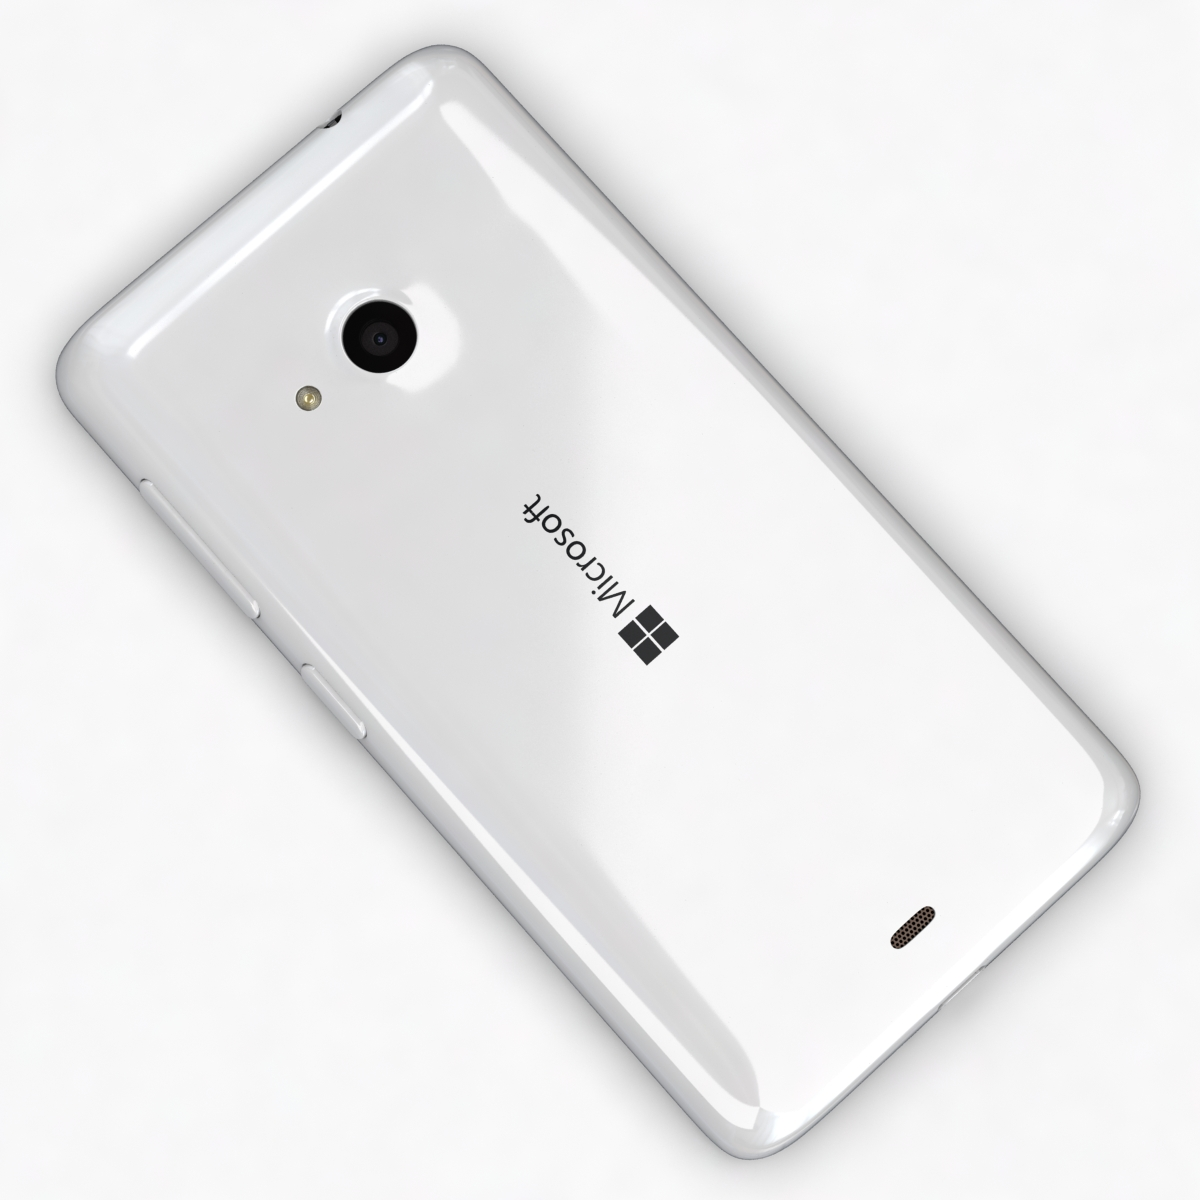 microsoft lumia 535 and dual sim white 3d model 3ds max fbx c4d obj 204287